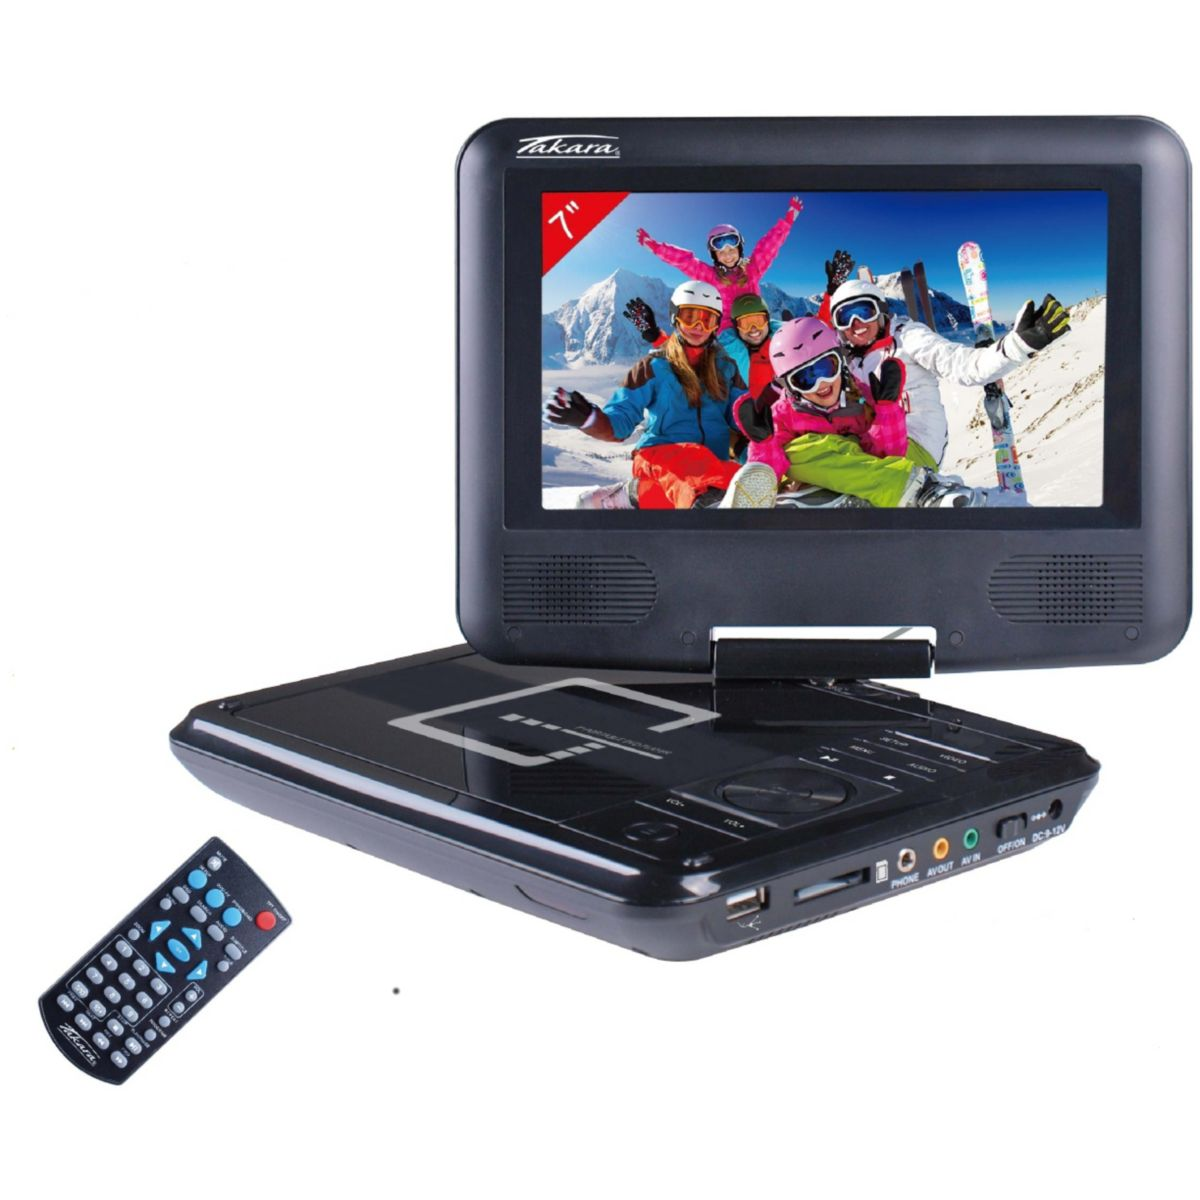 DVD Portable TAKARA VR132B (photo)